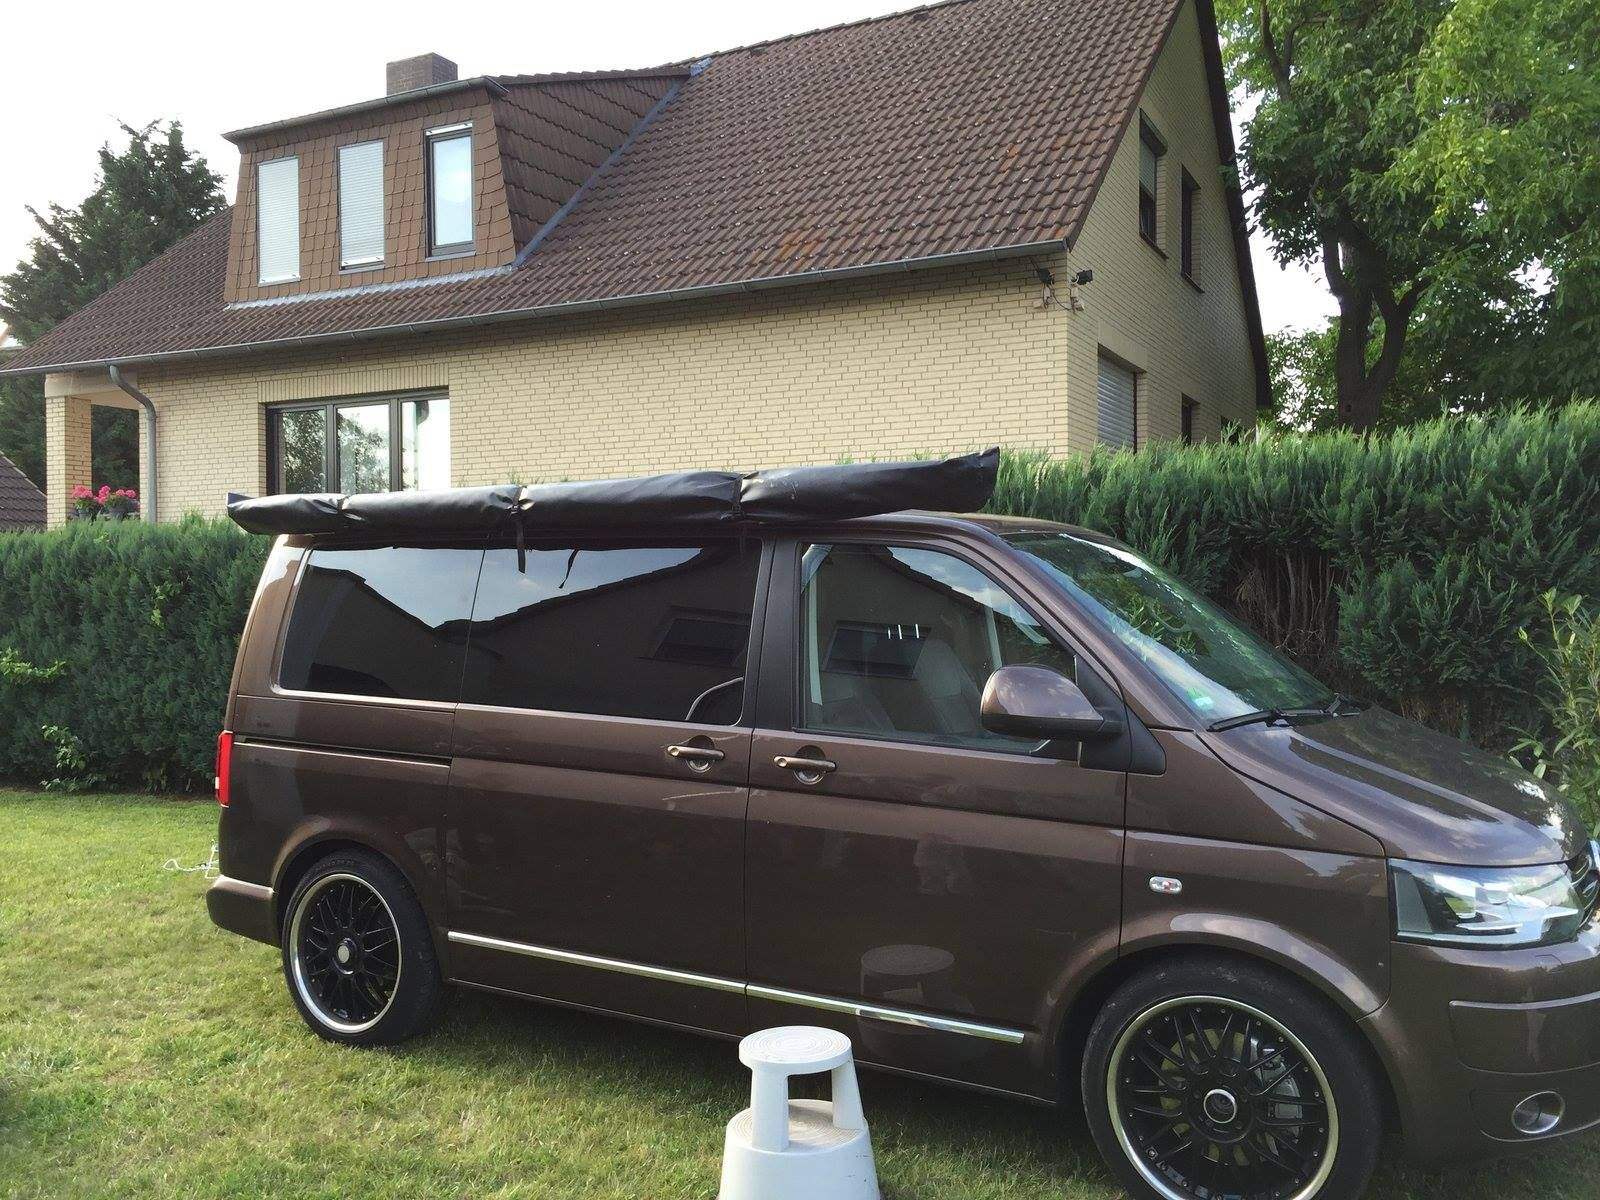 Vw t5 markise abanico fchermarkise foxwing pinterest camping vw t5 markise publicscrutiny Images